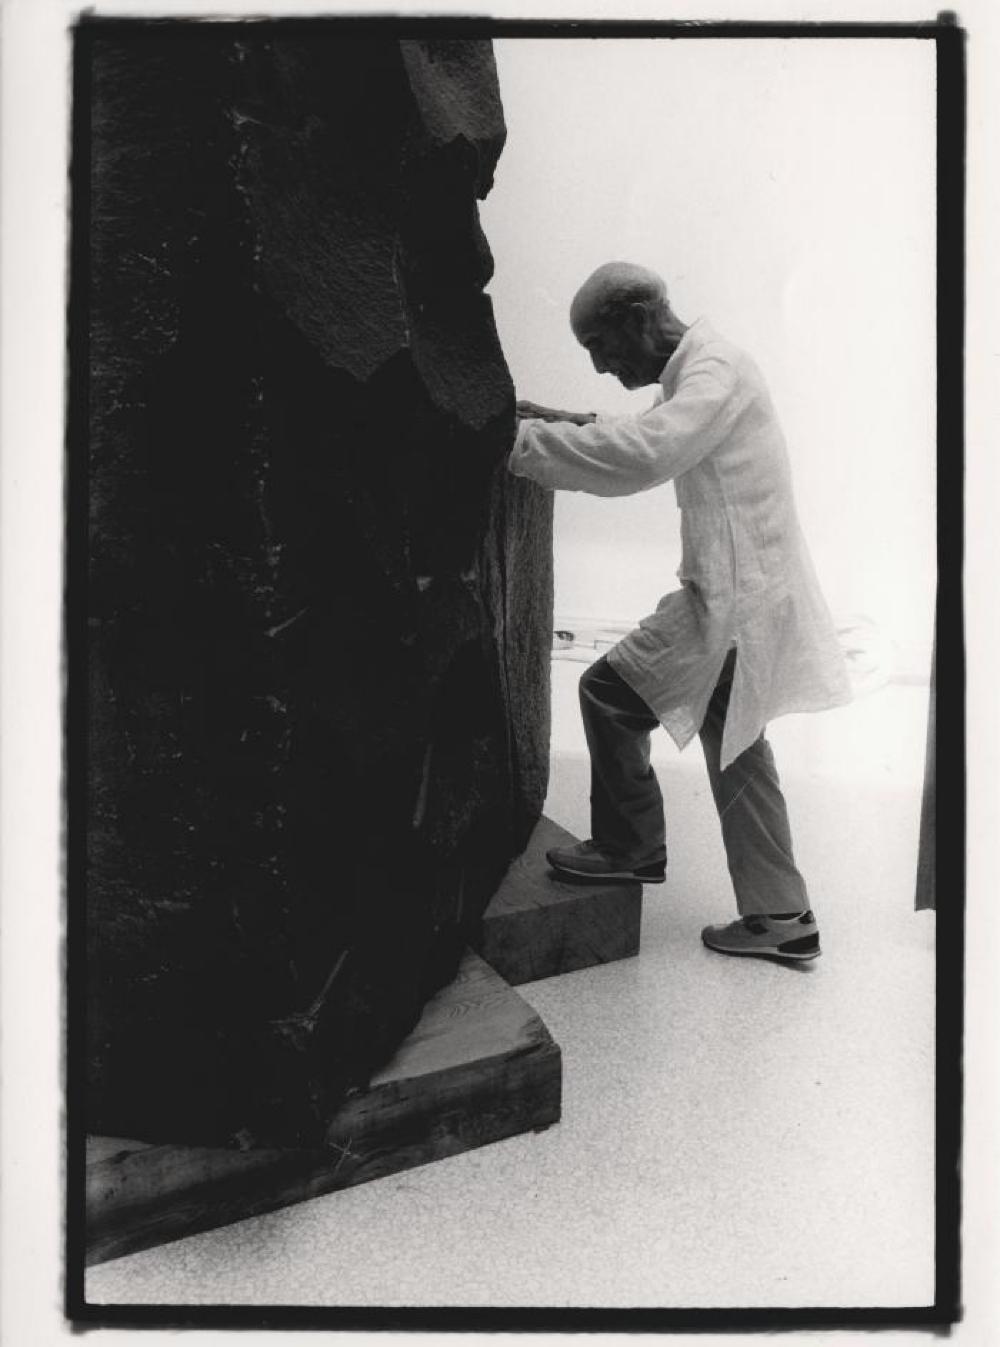 Isamu Noguchi with his sculpture in Venice